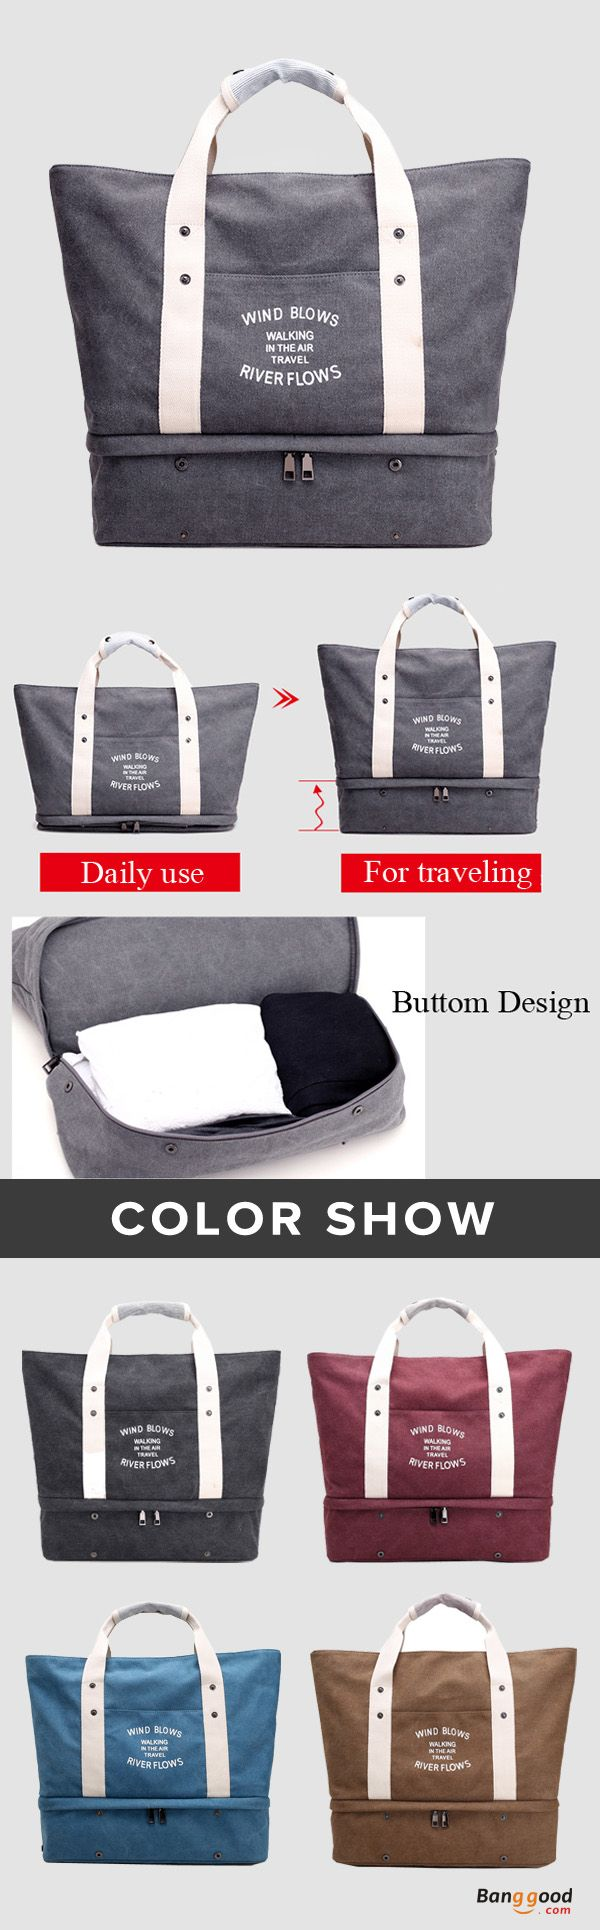 US$36.66+Free shipping. Women's Bag, Handbag, Travel Bag, Storage Bag, Quality, Canvas, Large Capacity. Color: Gray, Blue, Brown, Red, Dark Gray. Shop now~